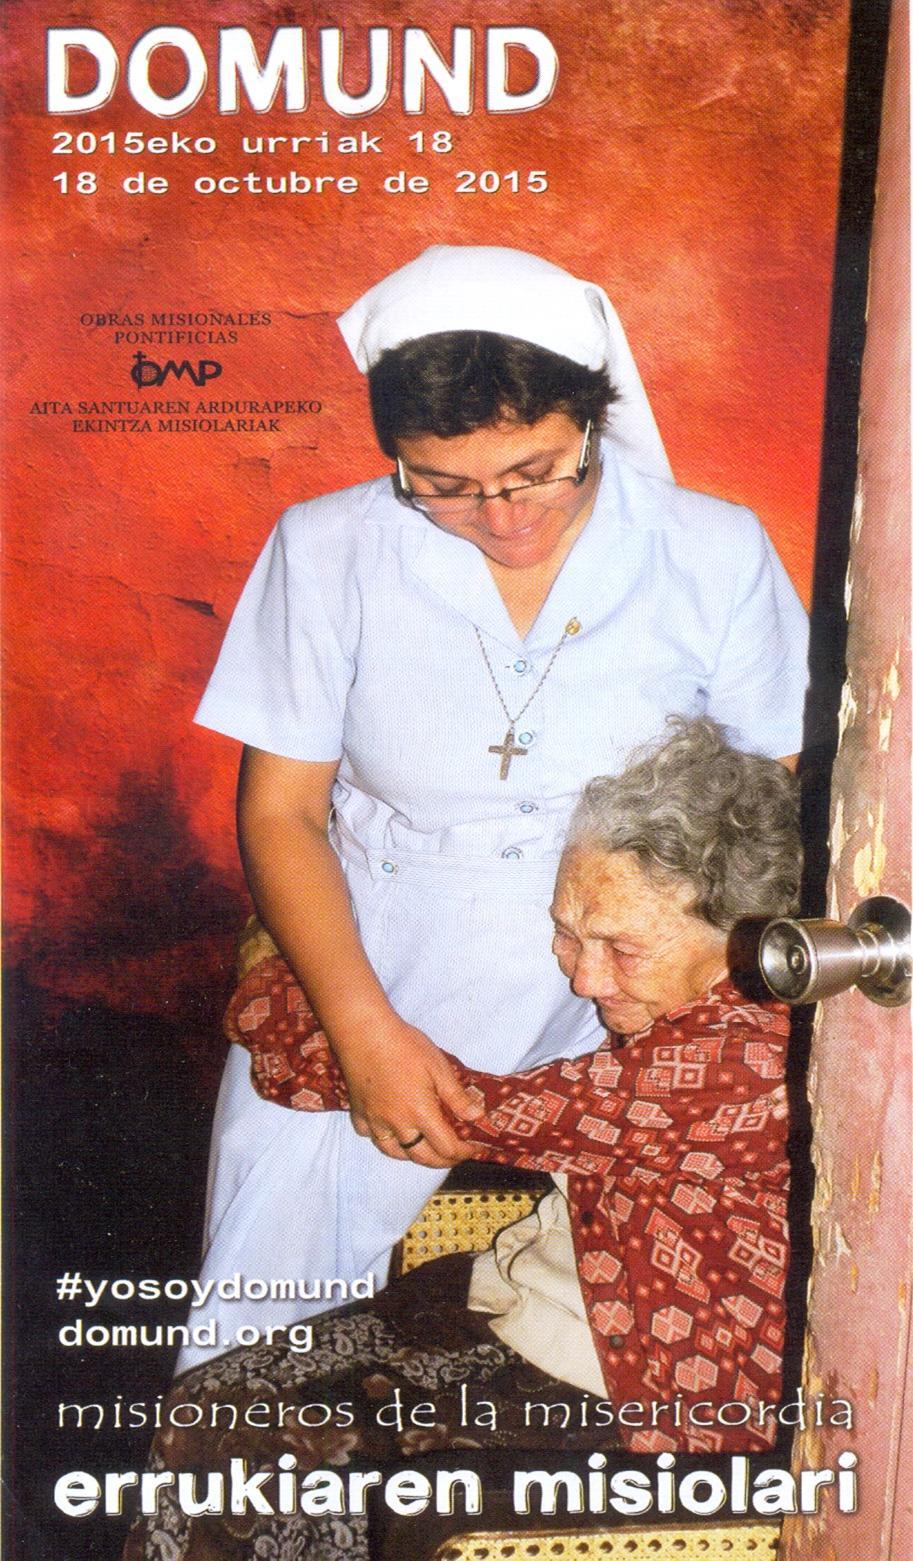 Misioneros de la Misericordia - Domund 2015